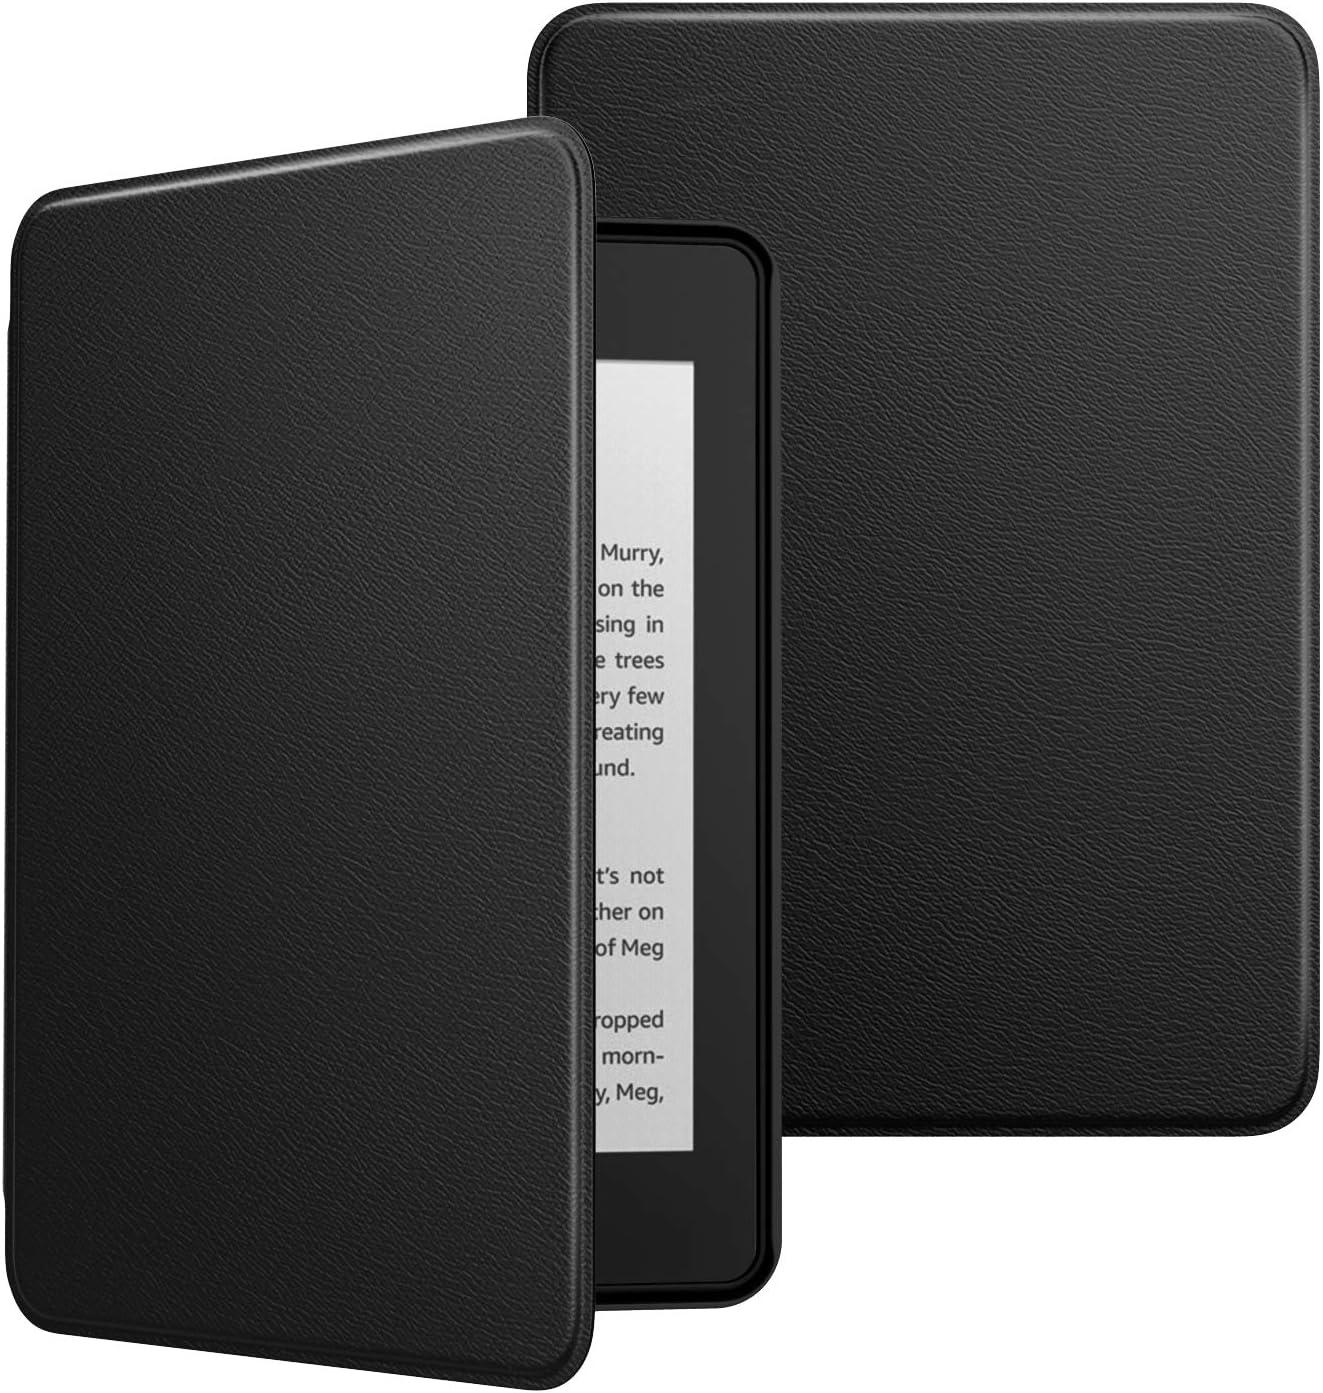 MoKo Funda para Kindle Paperwhite 10th Generation, 2018 Releases Ultra Delgada Ligera Smart-Shell Soporte Cover Case para  Kindle Paperwhite E-Reader Blanco